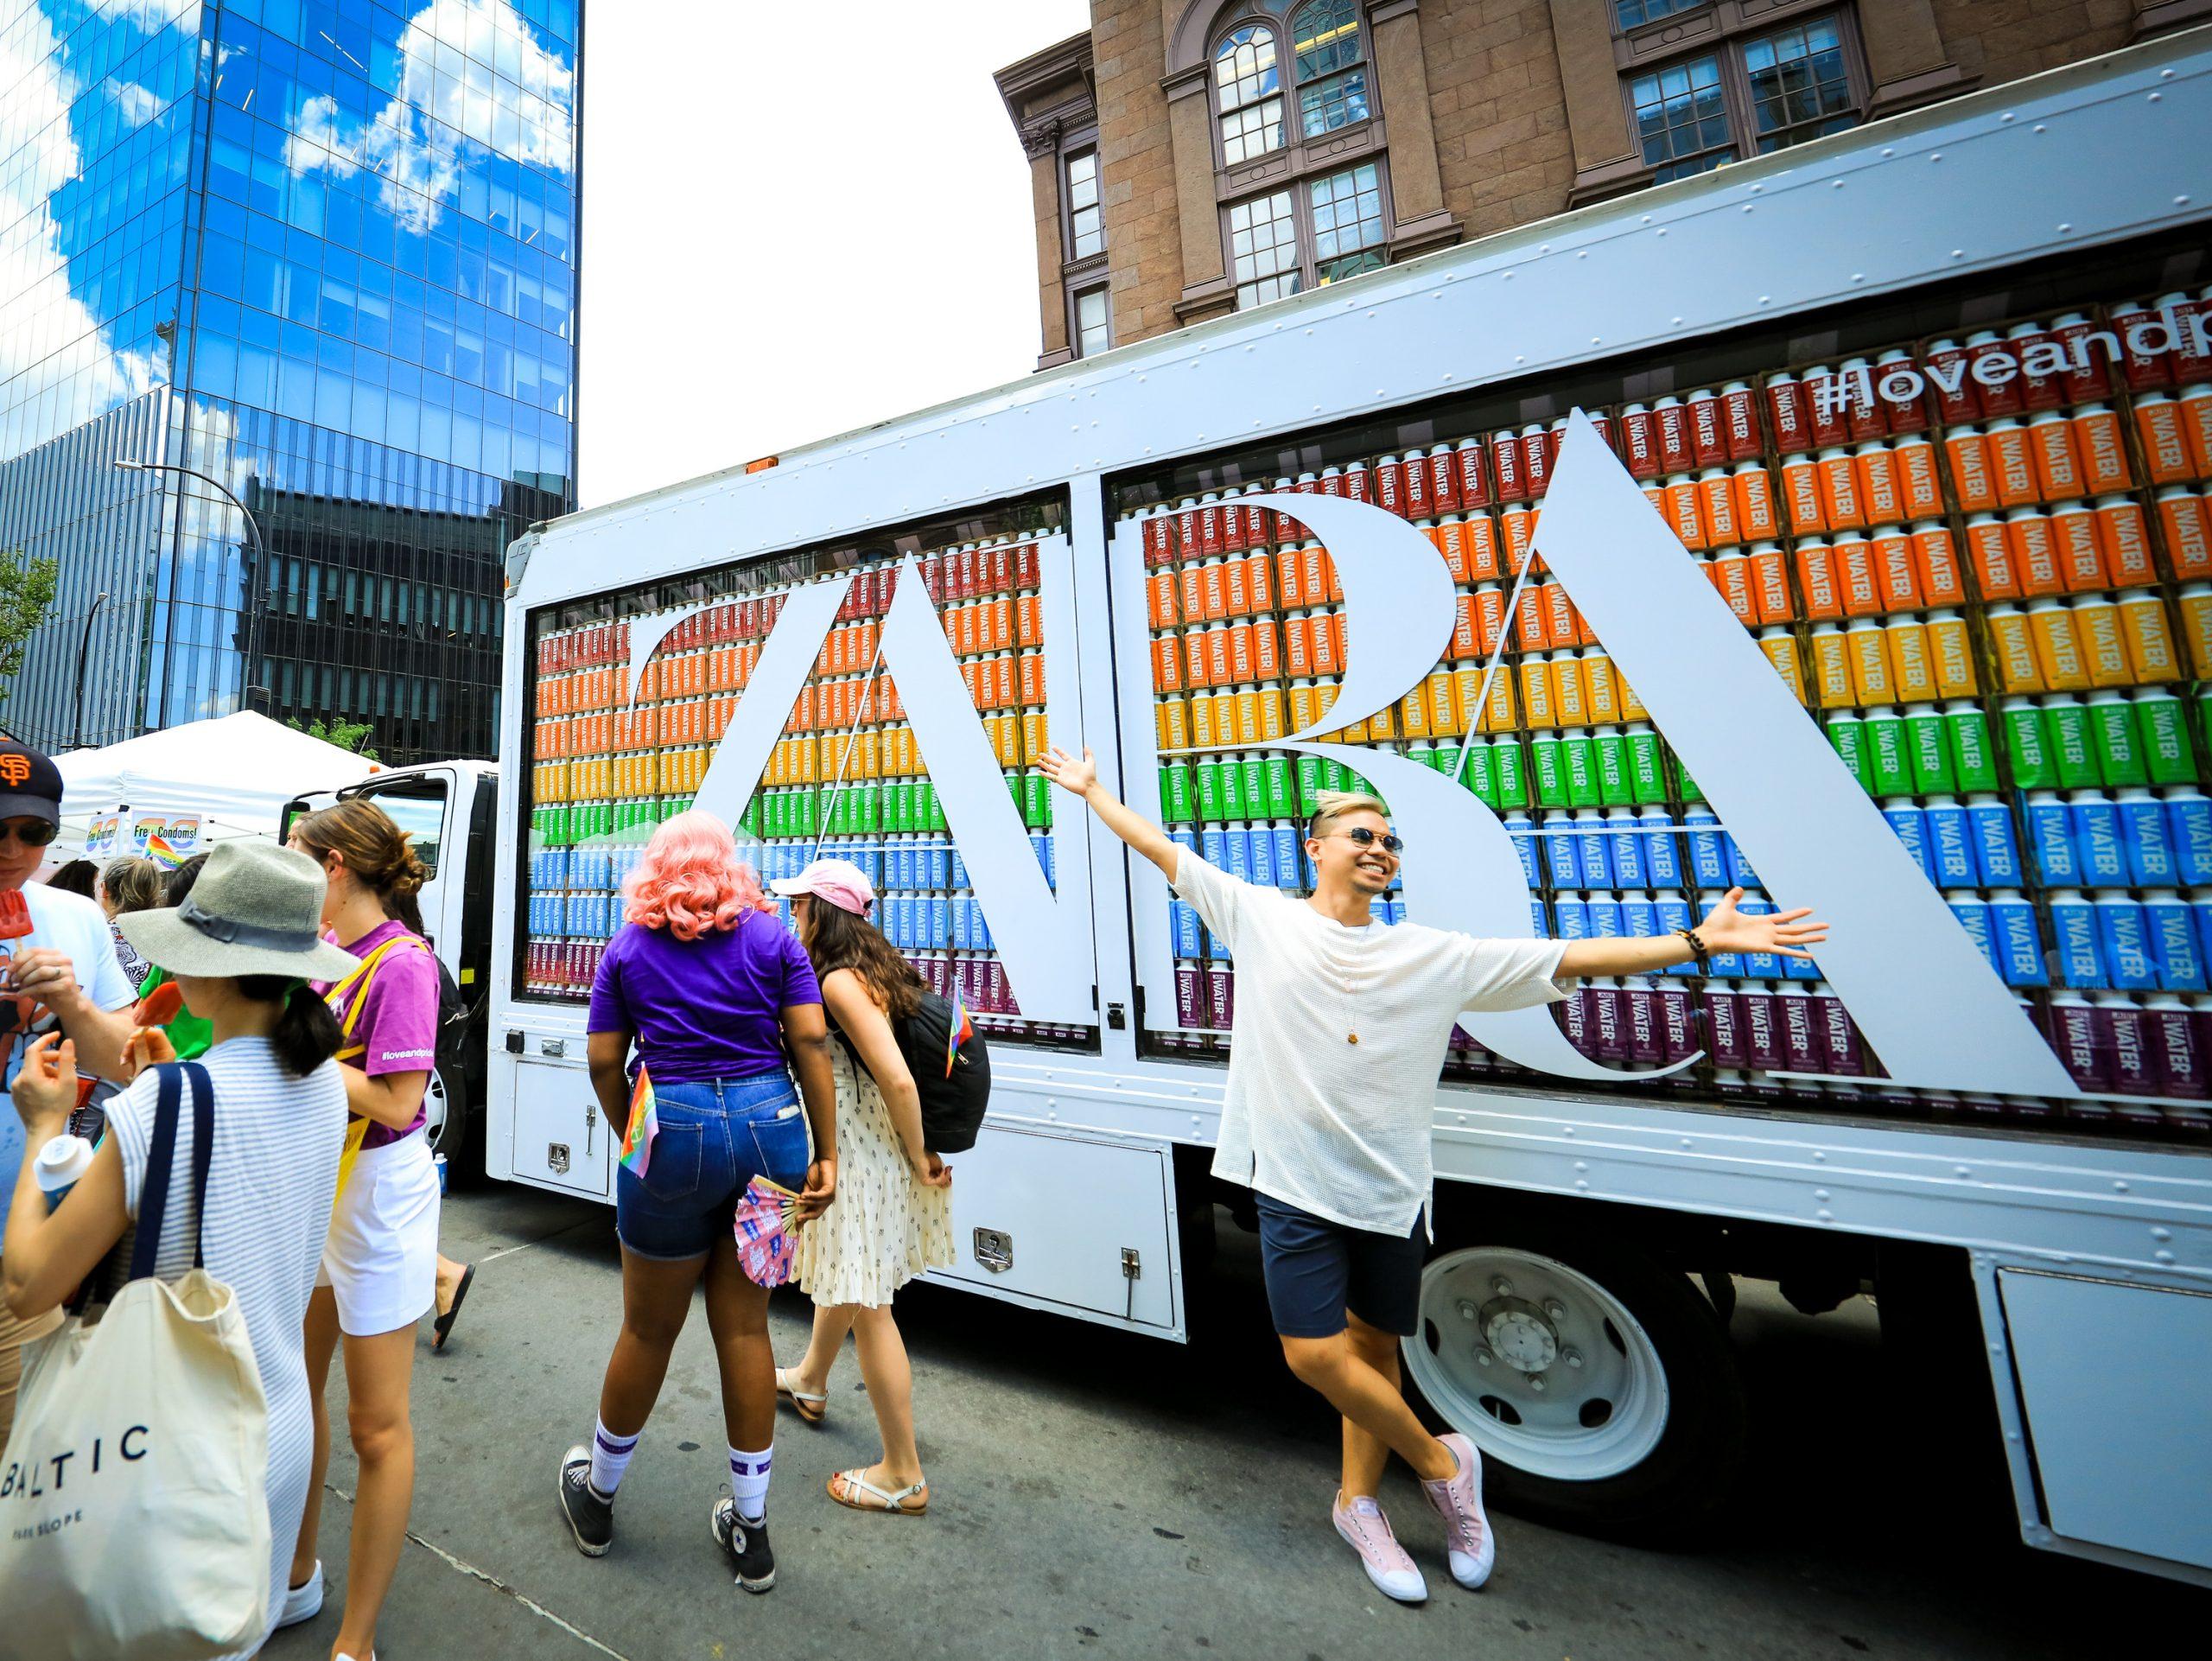 Zara glass showroom truck